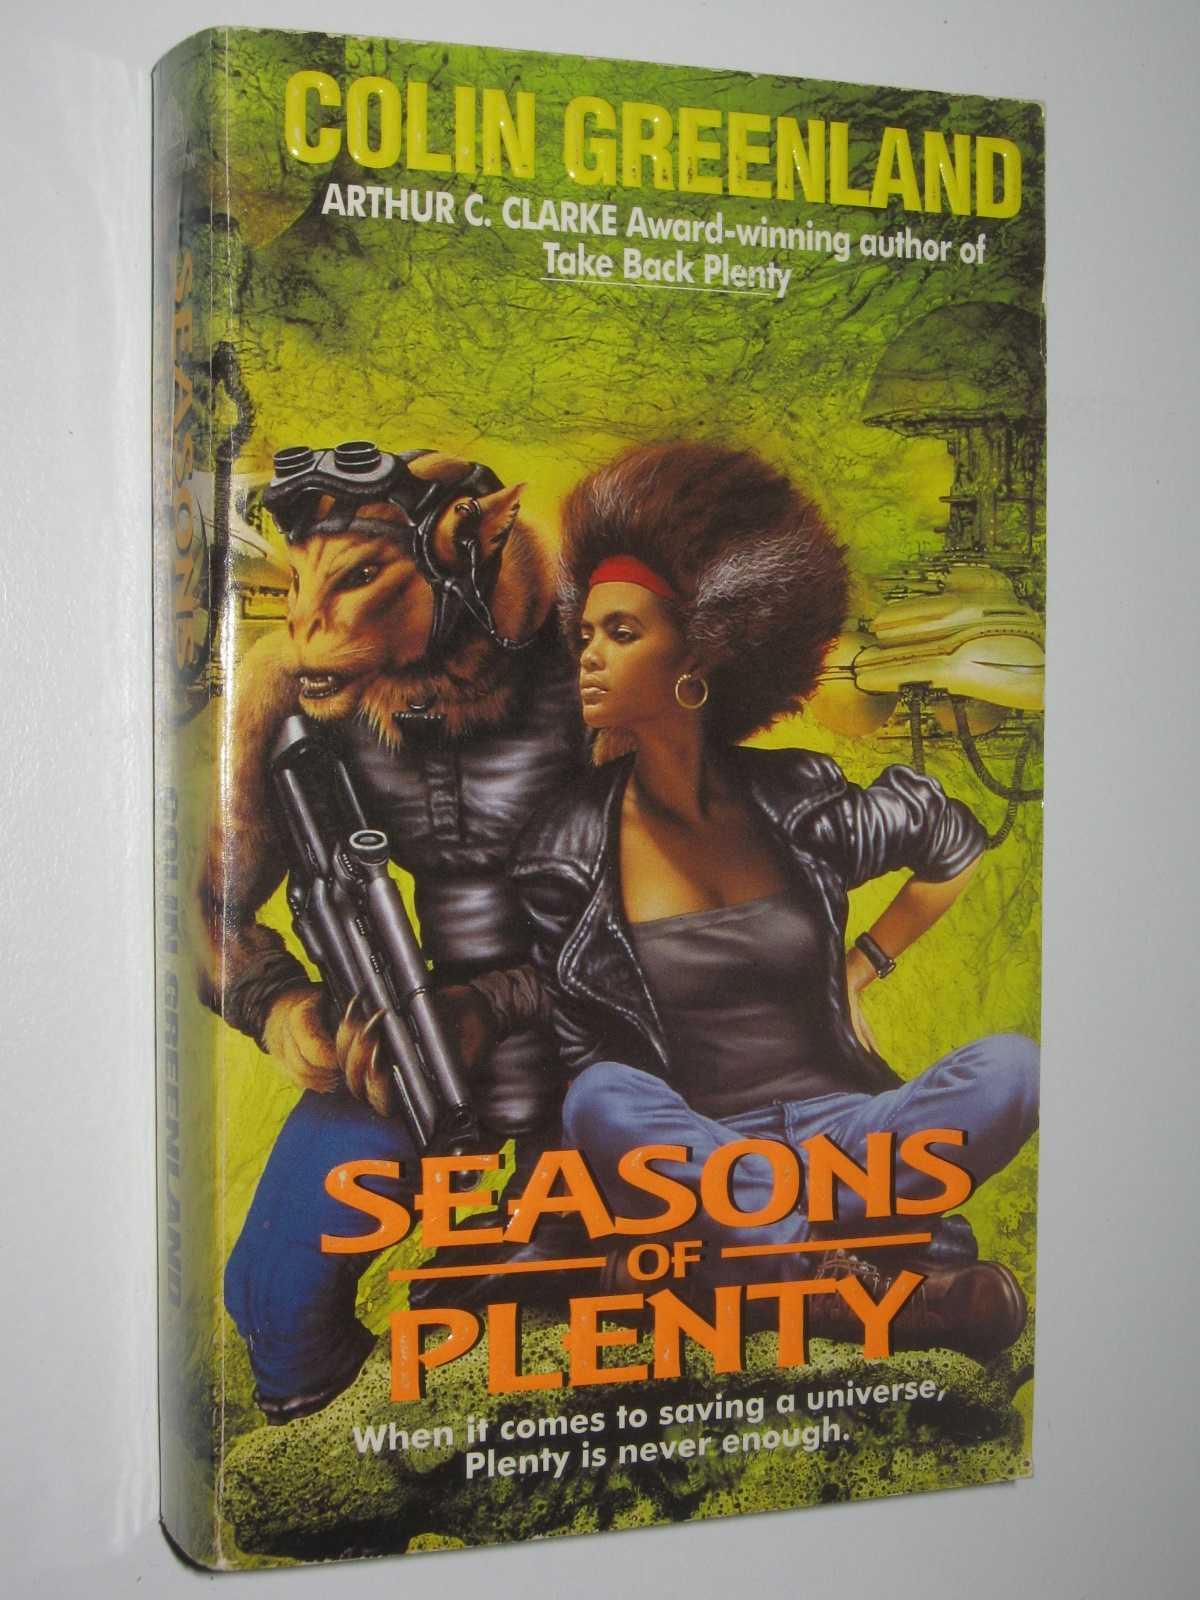 Seasons of Plenty, Greenland, Colin